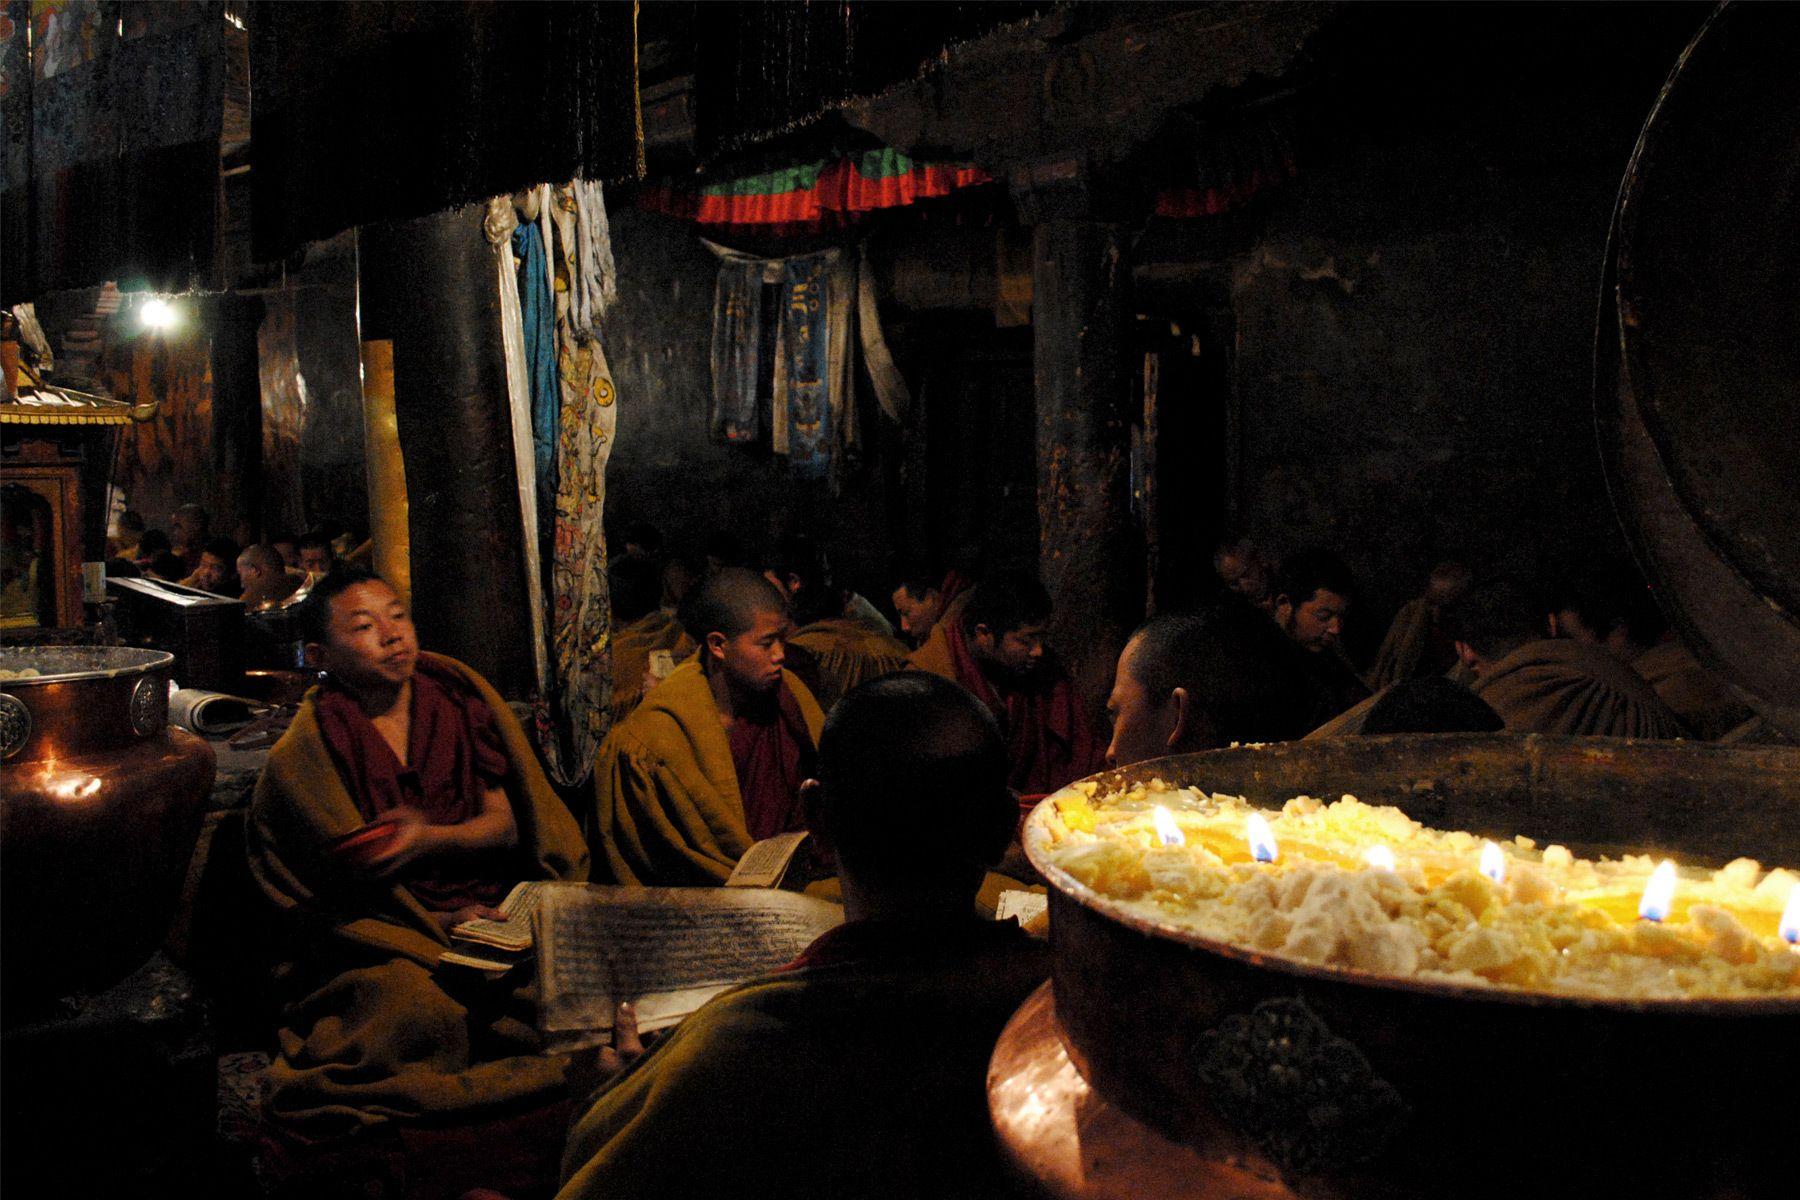 1r12___tibet_temple_templo_monk_buddhist_buddhism_budista_monje.jpg